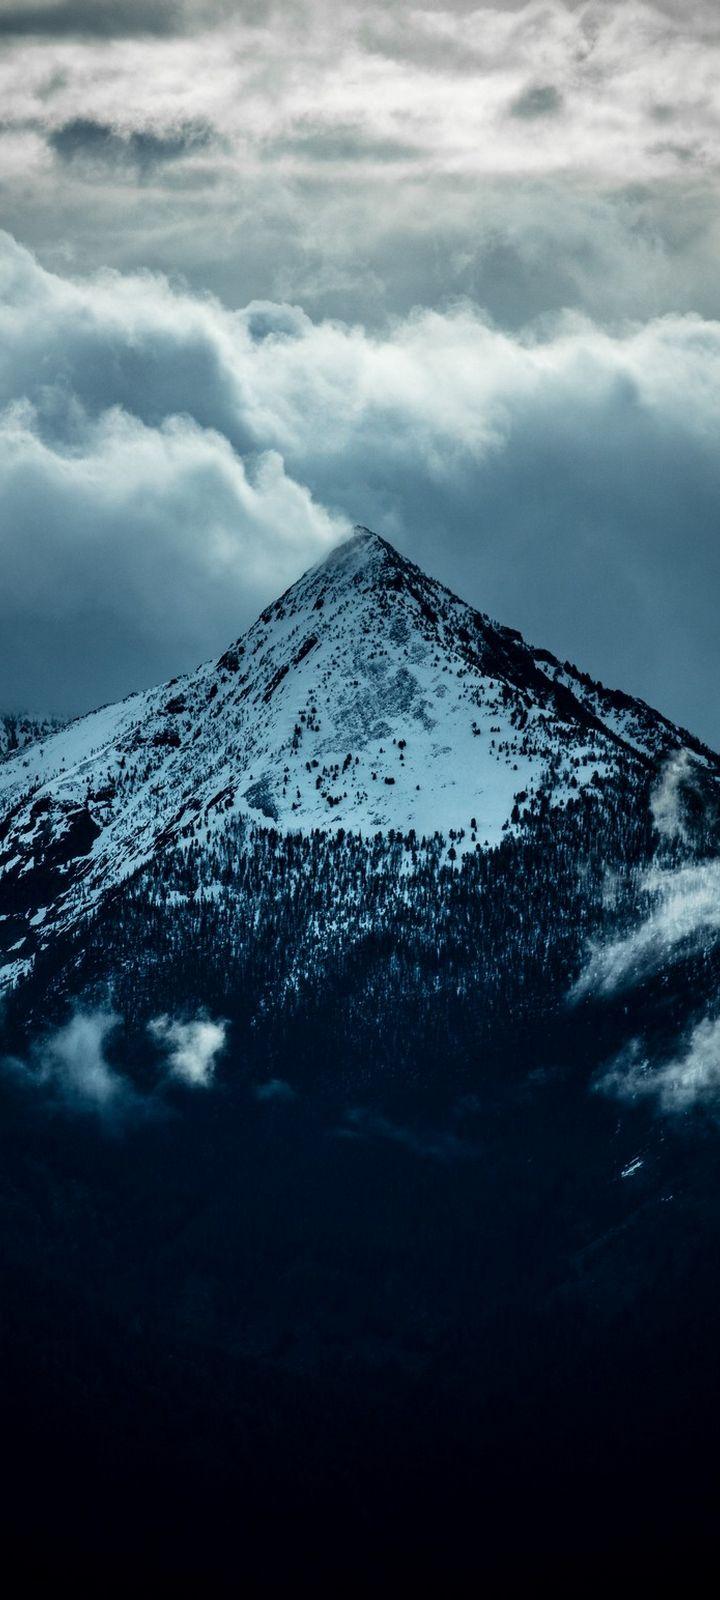 Mountain Peak Clouds Wallpaper 720x1600